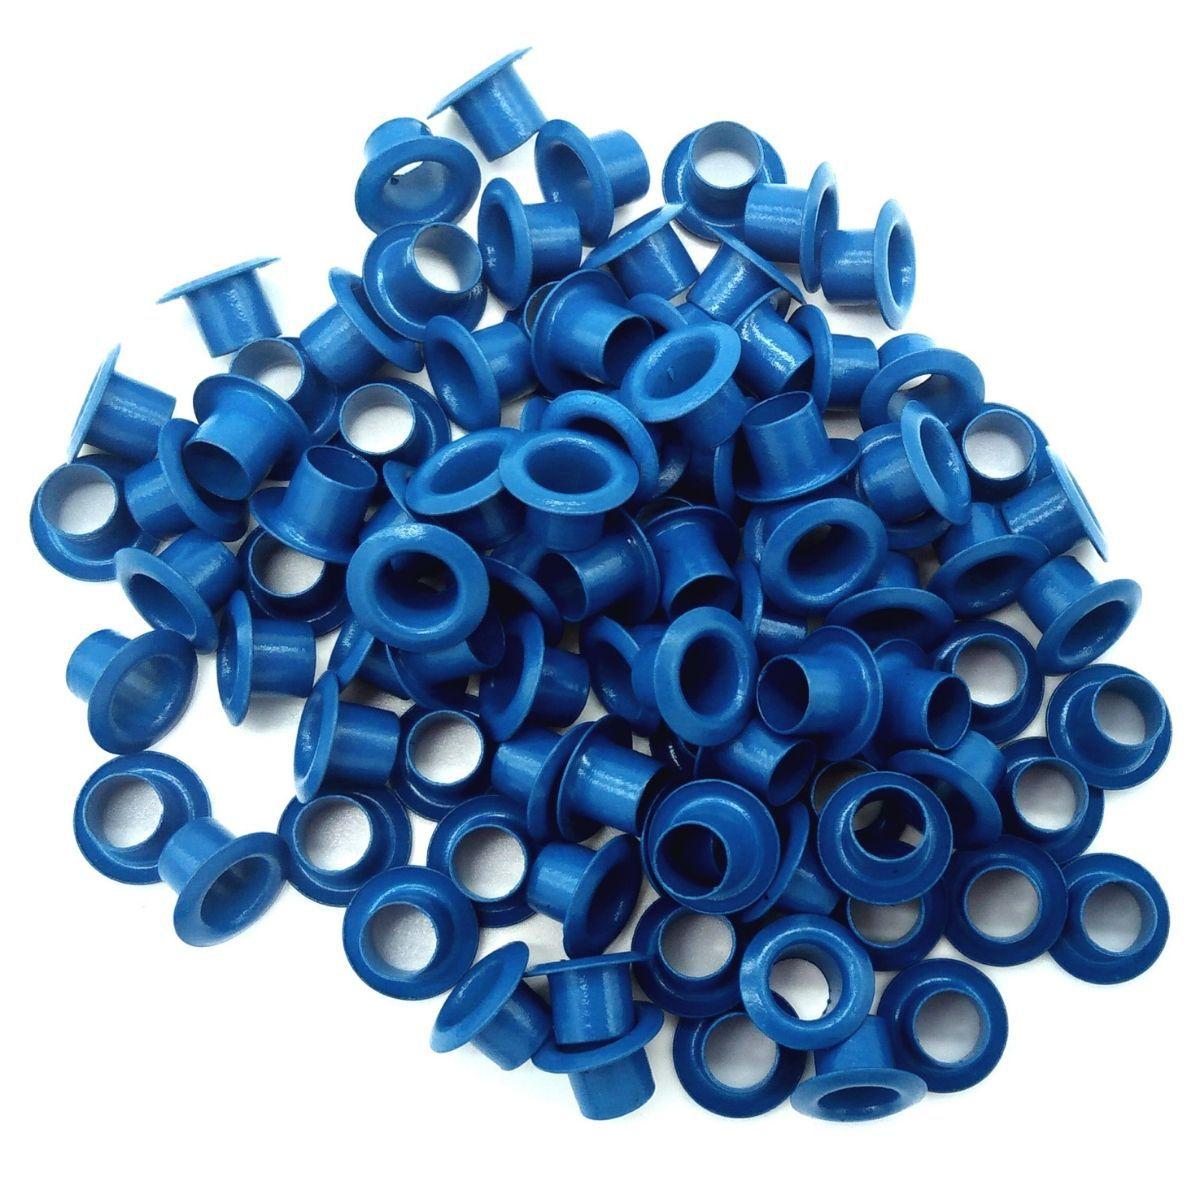 Ilhós Ferro Azul Nº 50 11mm de diâmetro externo